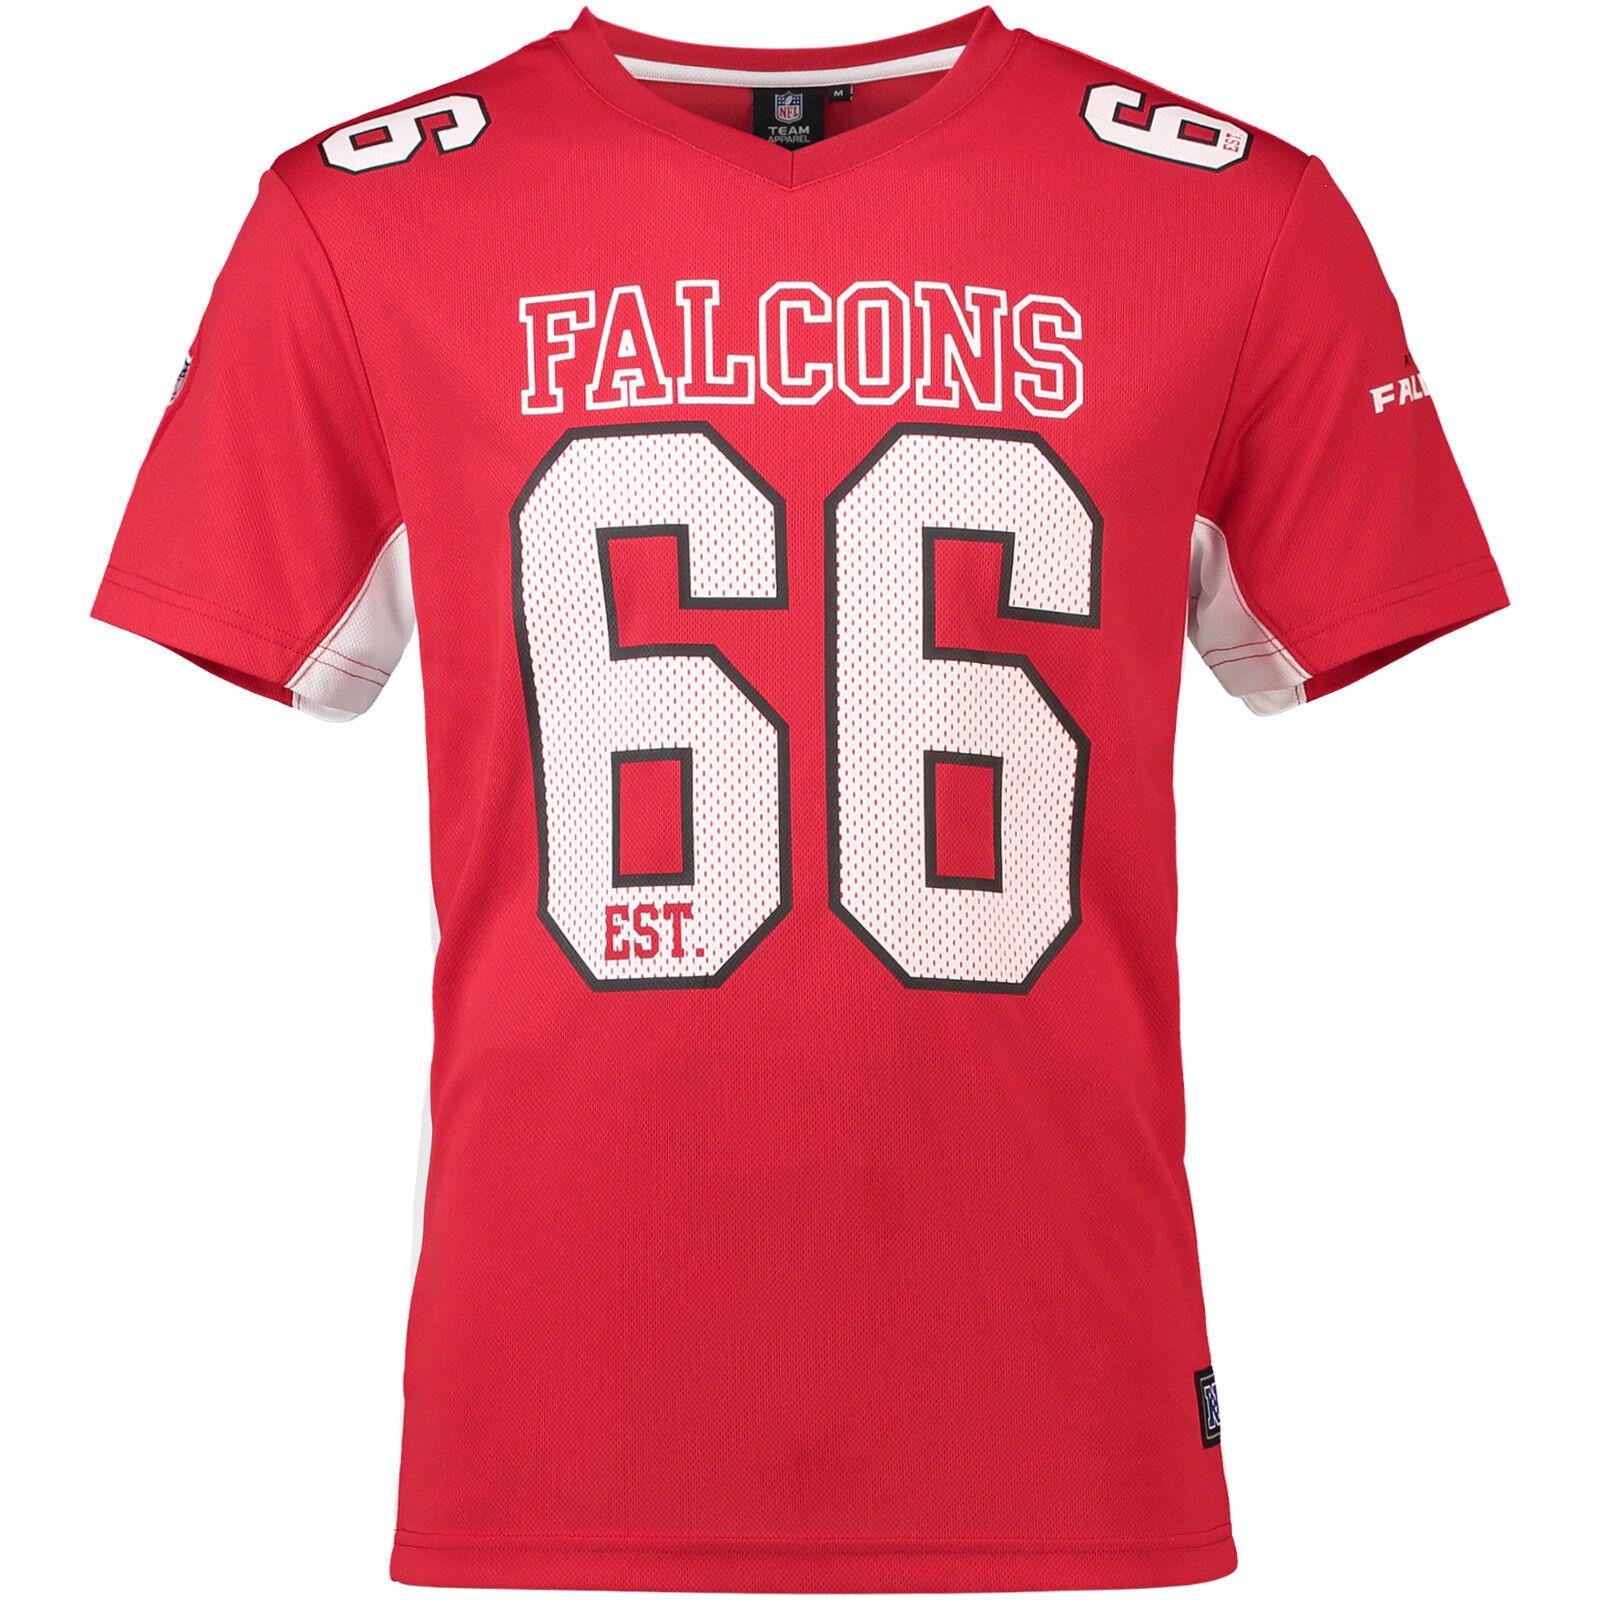 NFL Atlanta Falcons 66 MAGLIA JERSEY SHIRT Moro 2018 mesh poligonale FOOTBALL ROSSO